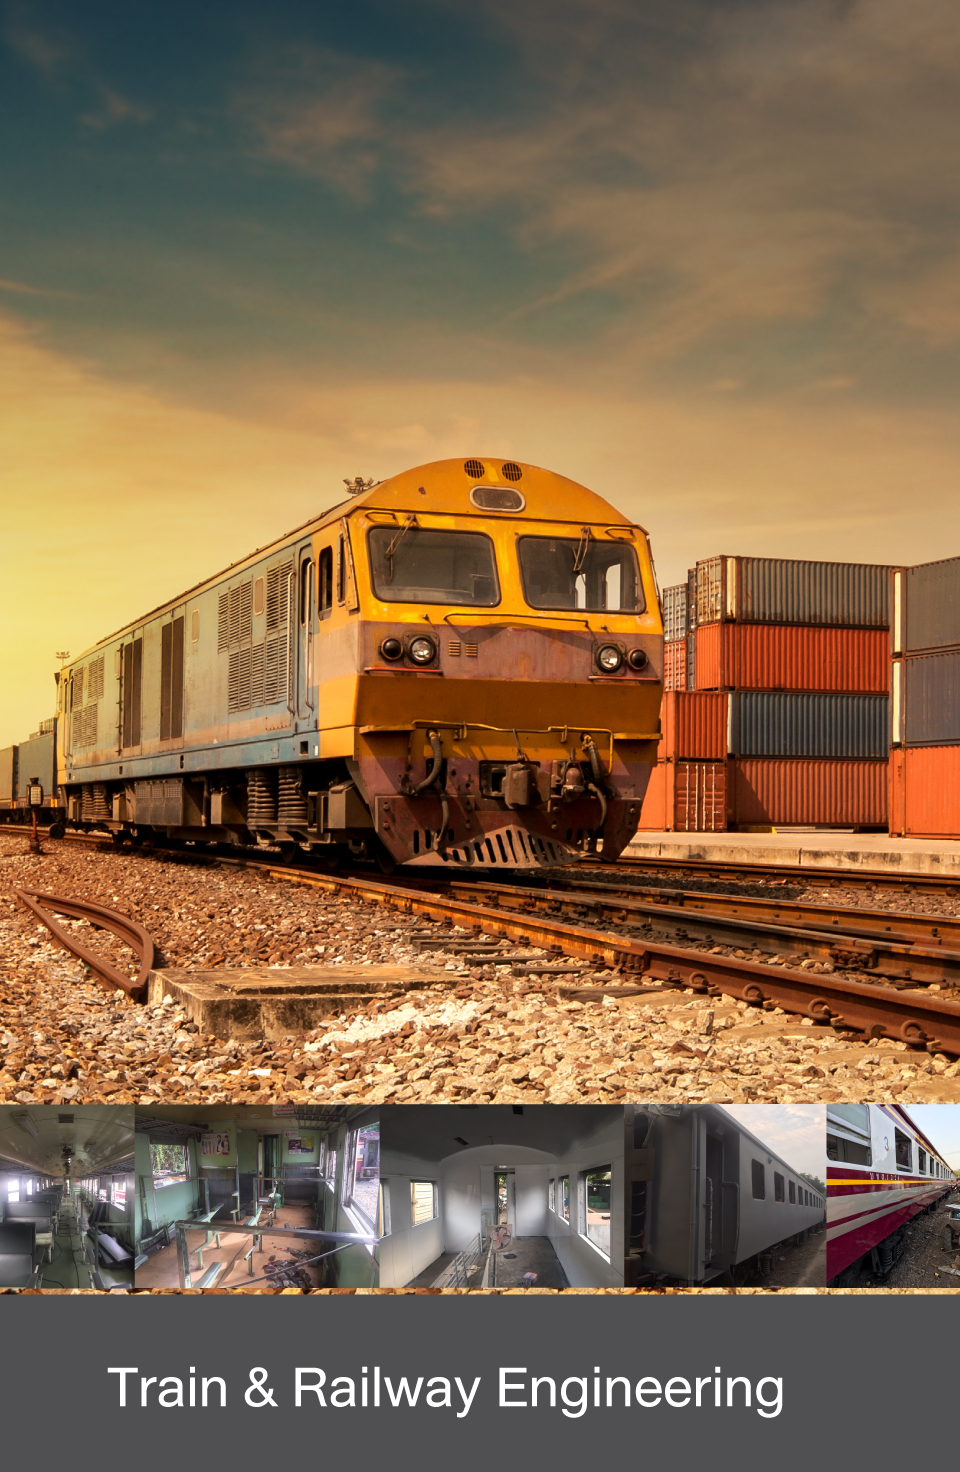 Train Railway Engineering Divition